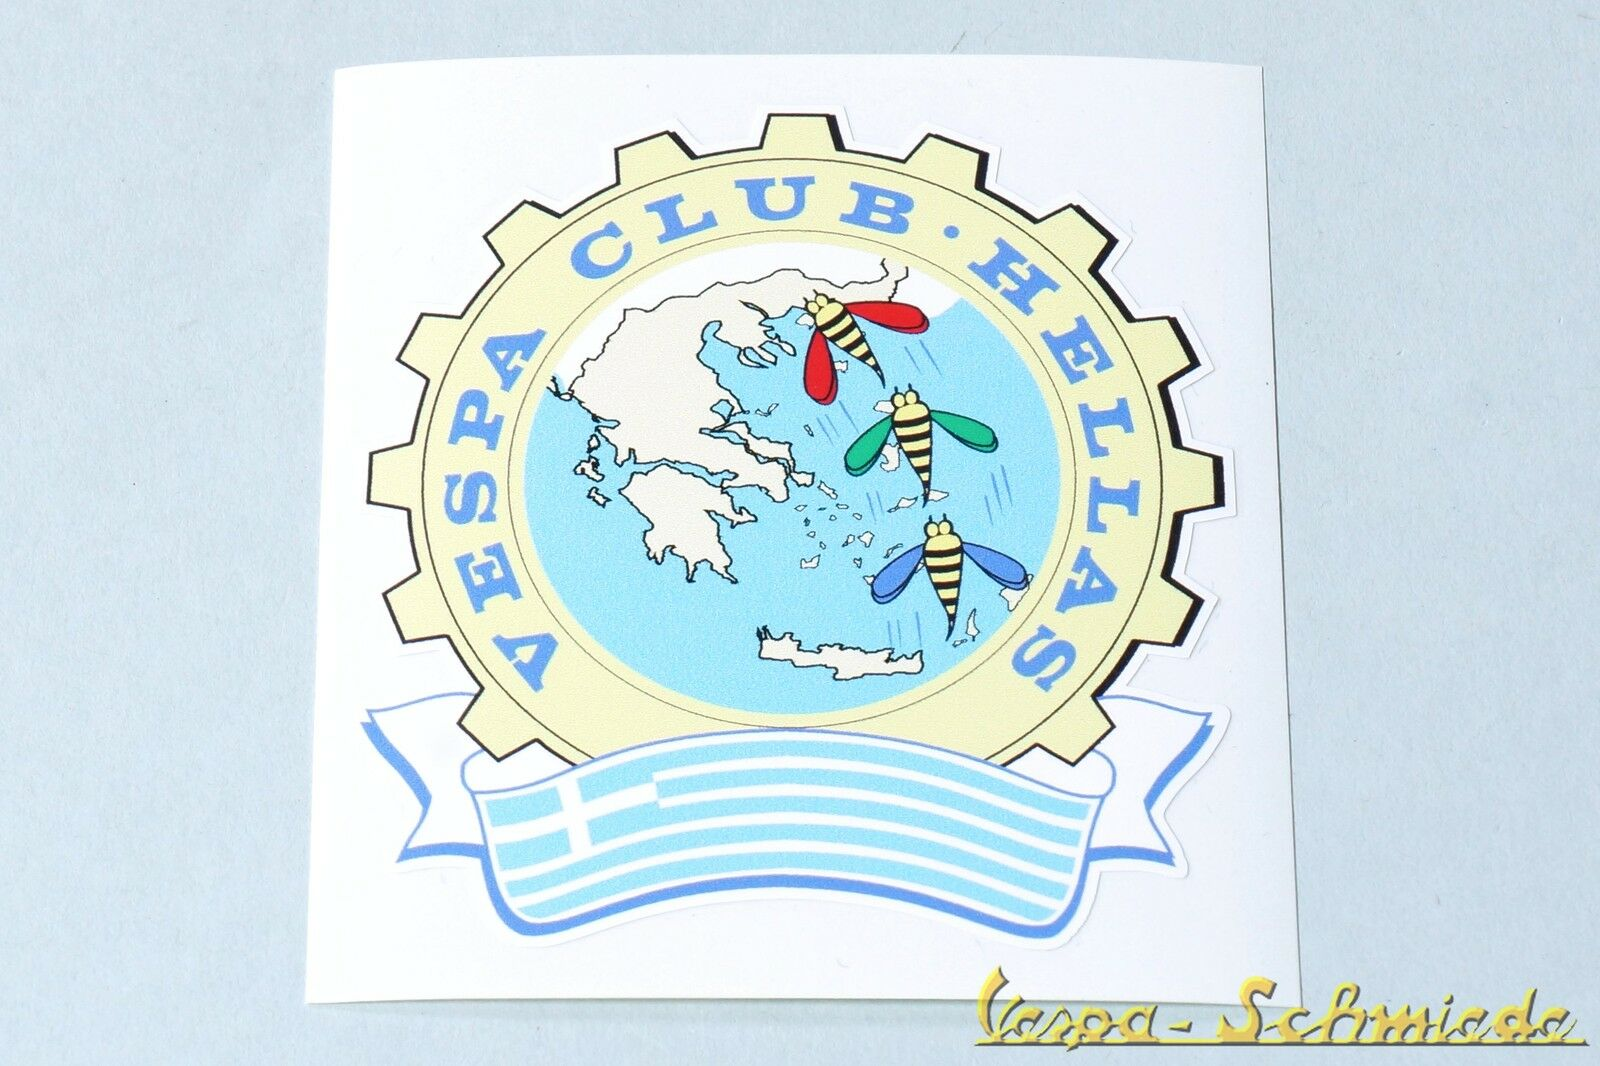 "Decor Sticker /"" Vespa Club Firenze /"" Florence Italy V50 Pk Club"